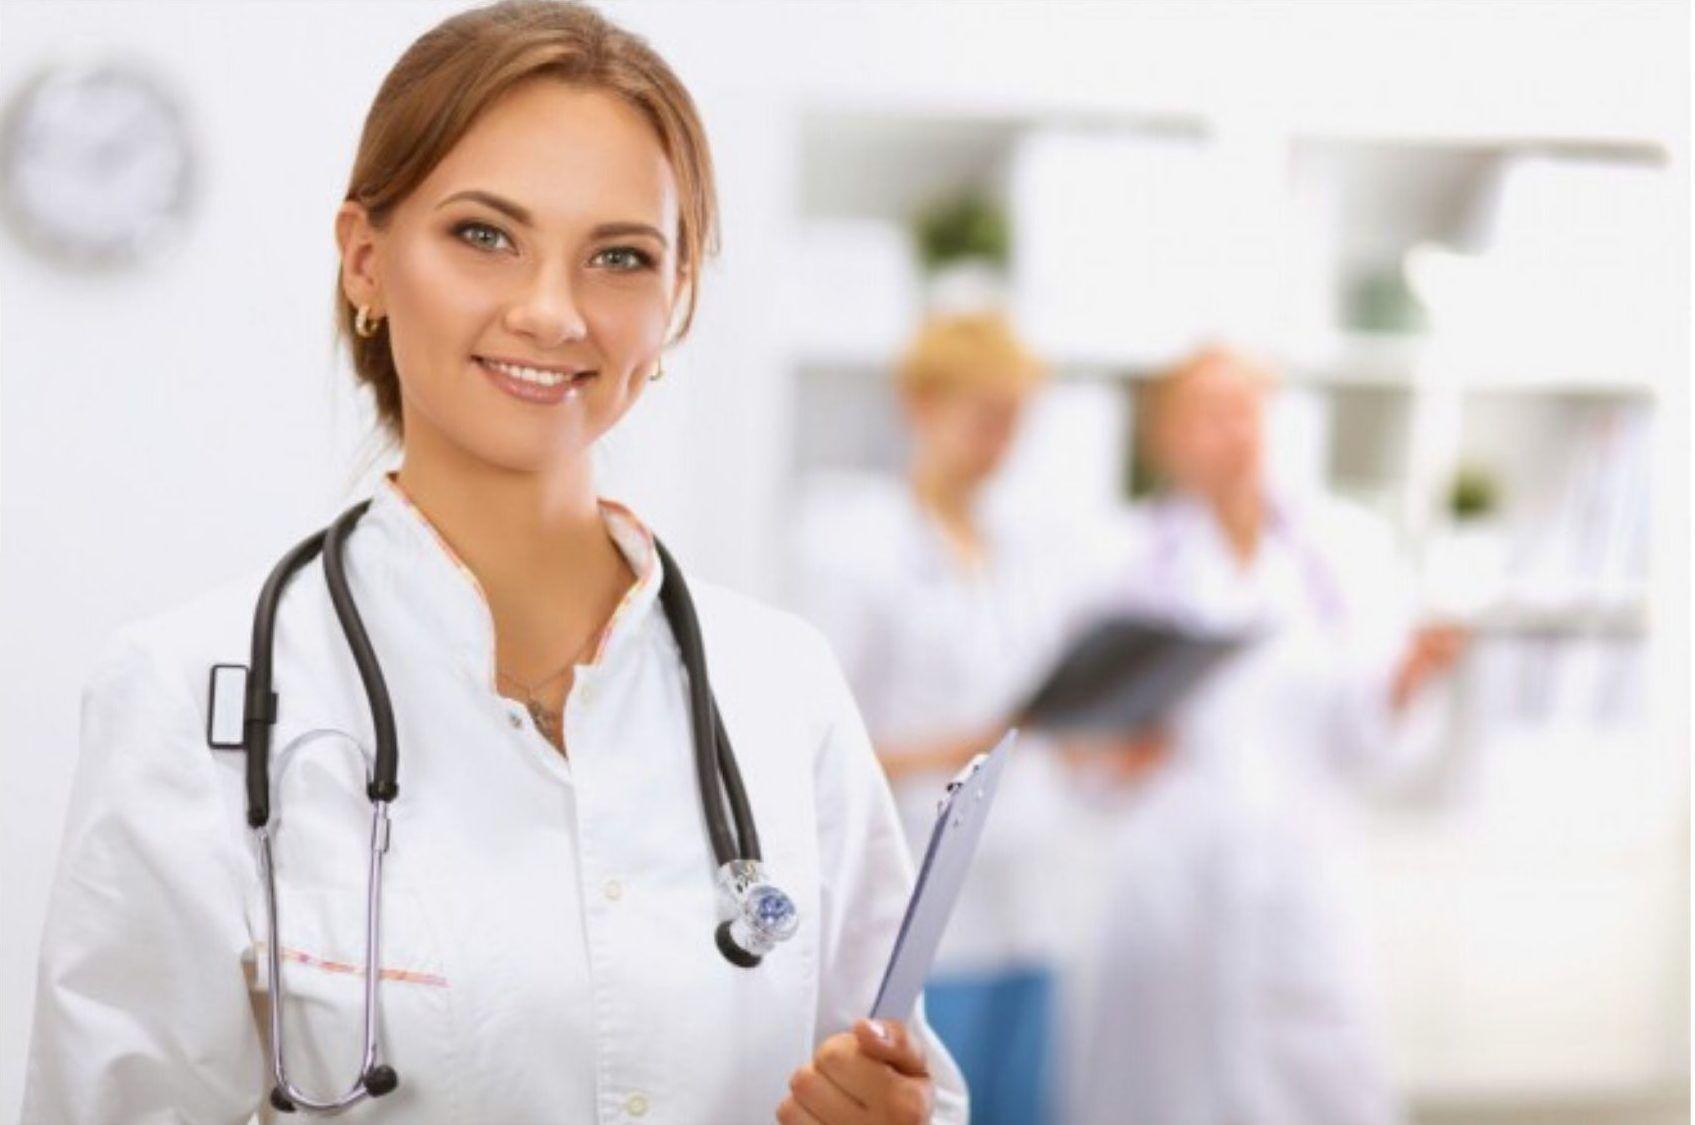 féminisation de la médecine